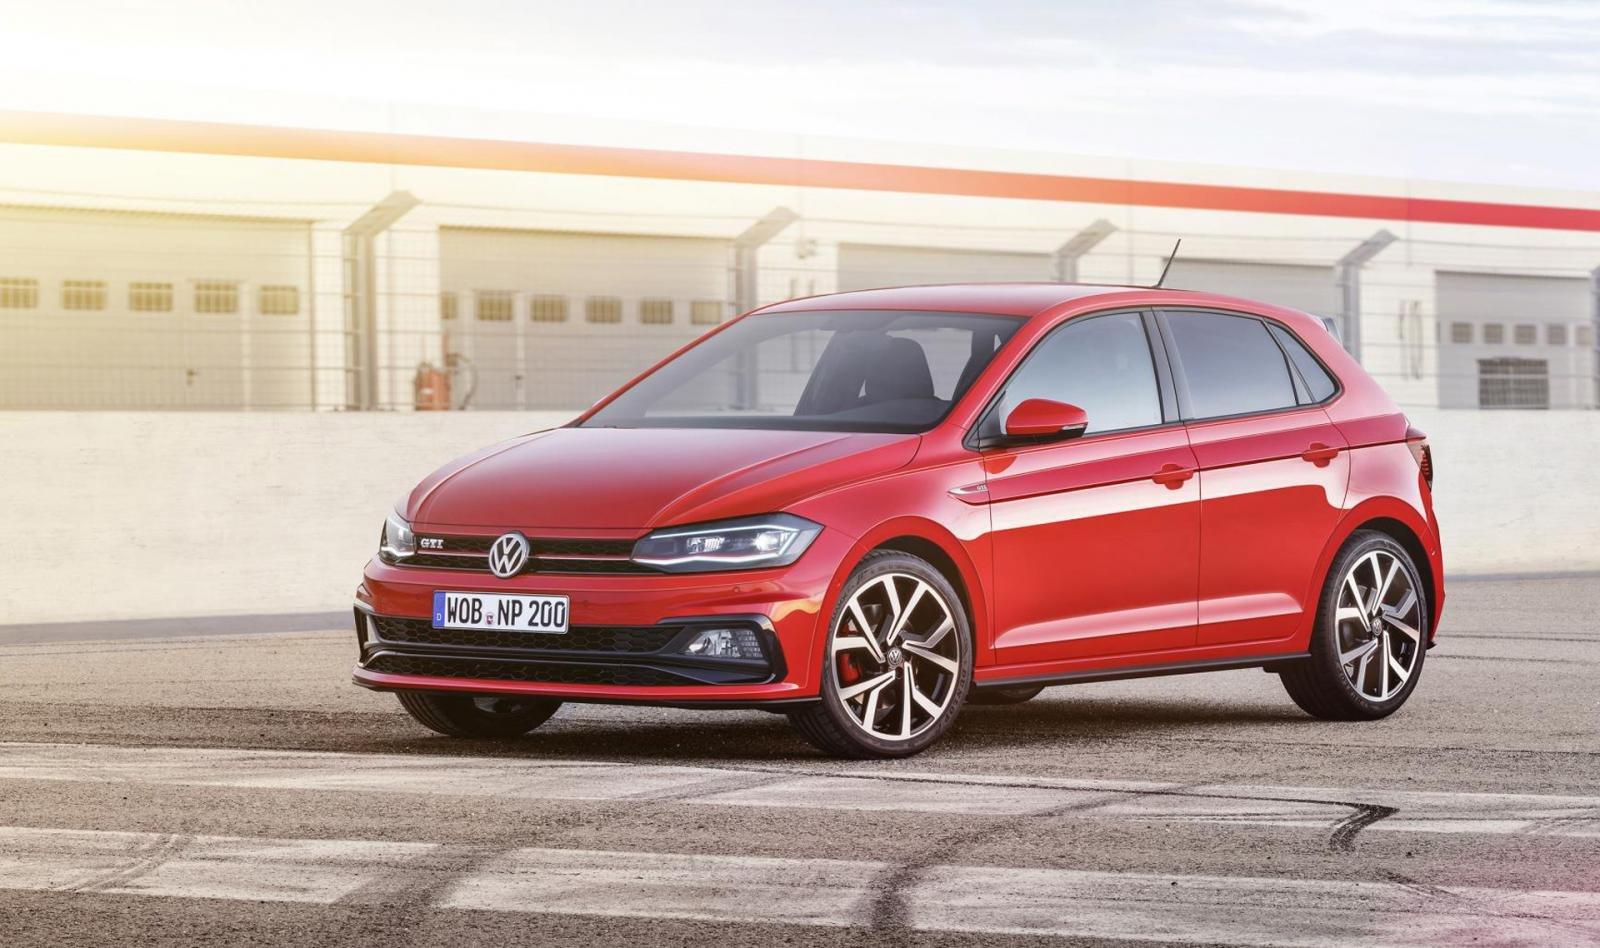 Giá xe Volkswagen Polo cũ